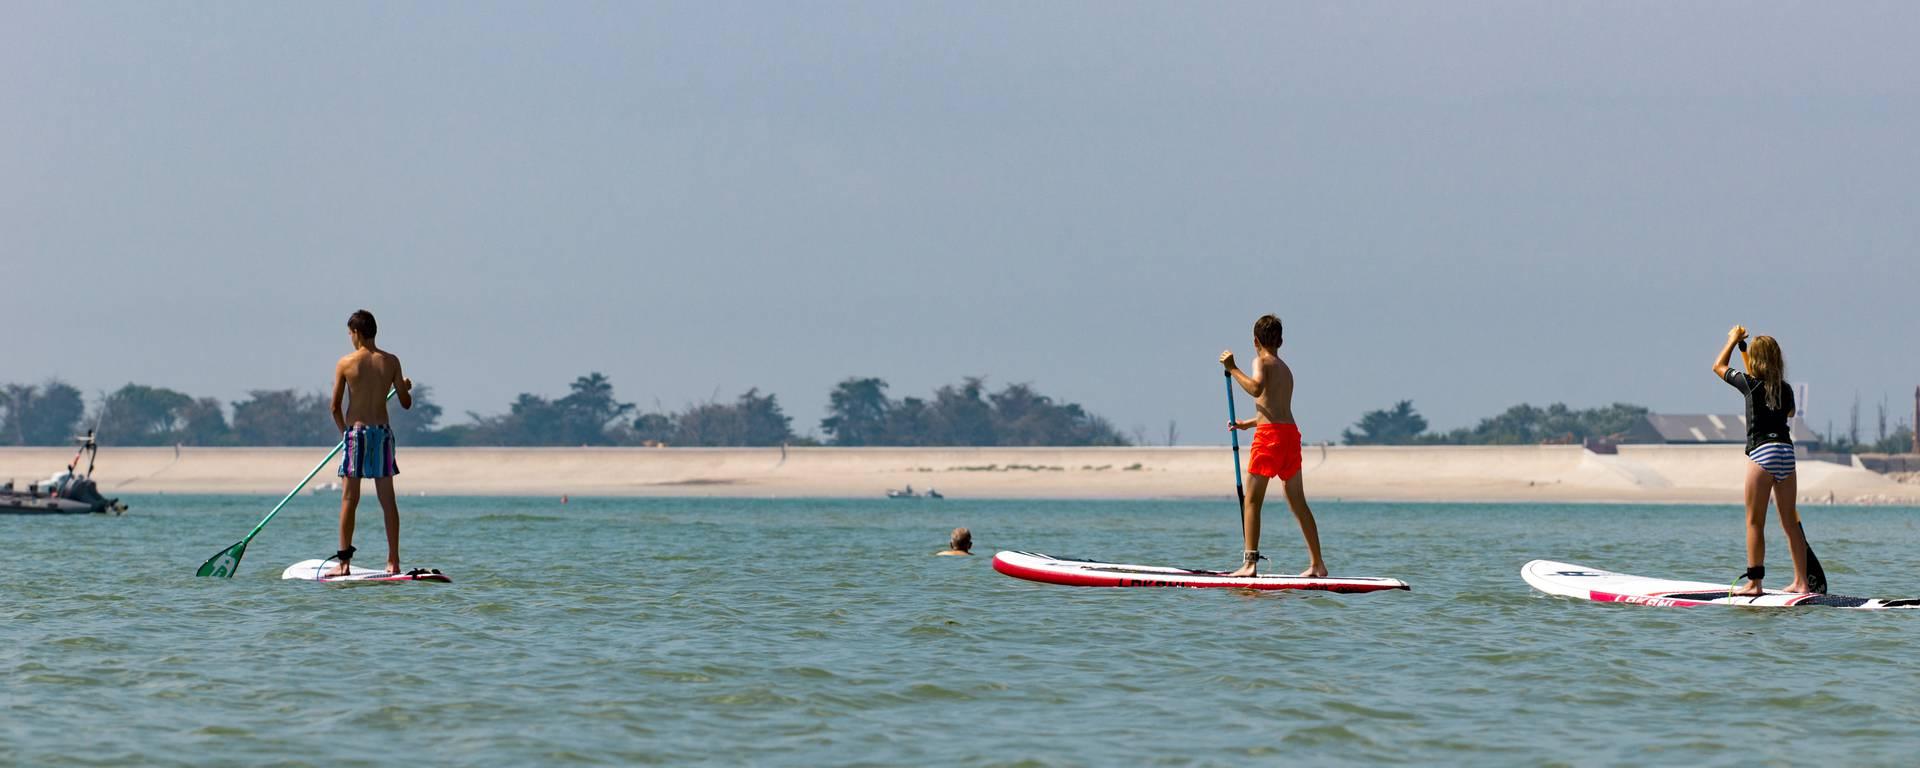 paddle by Yann Werdefroy